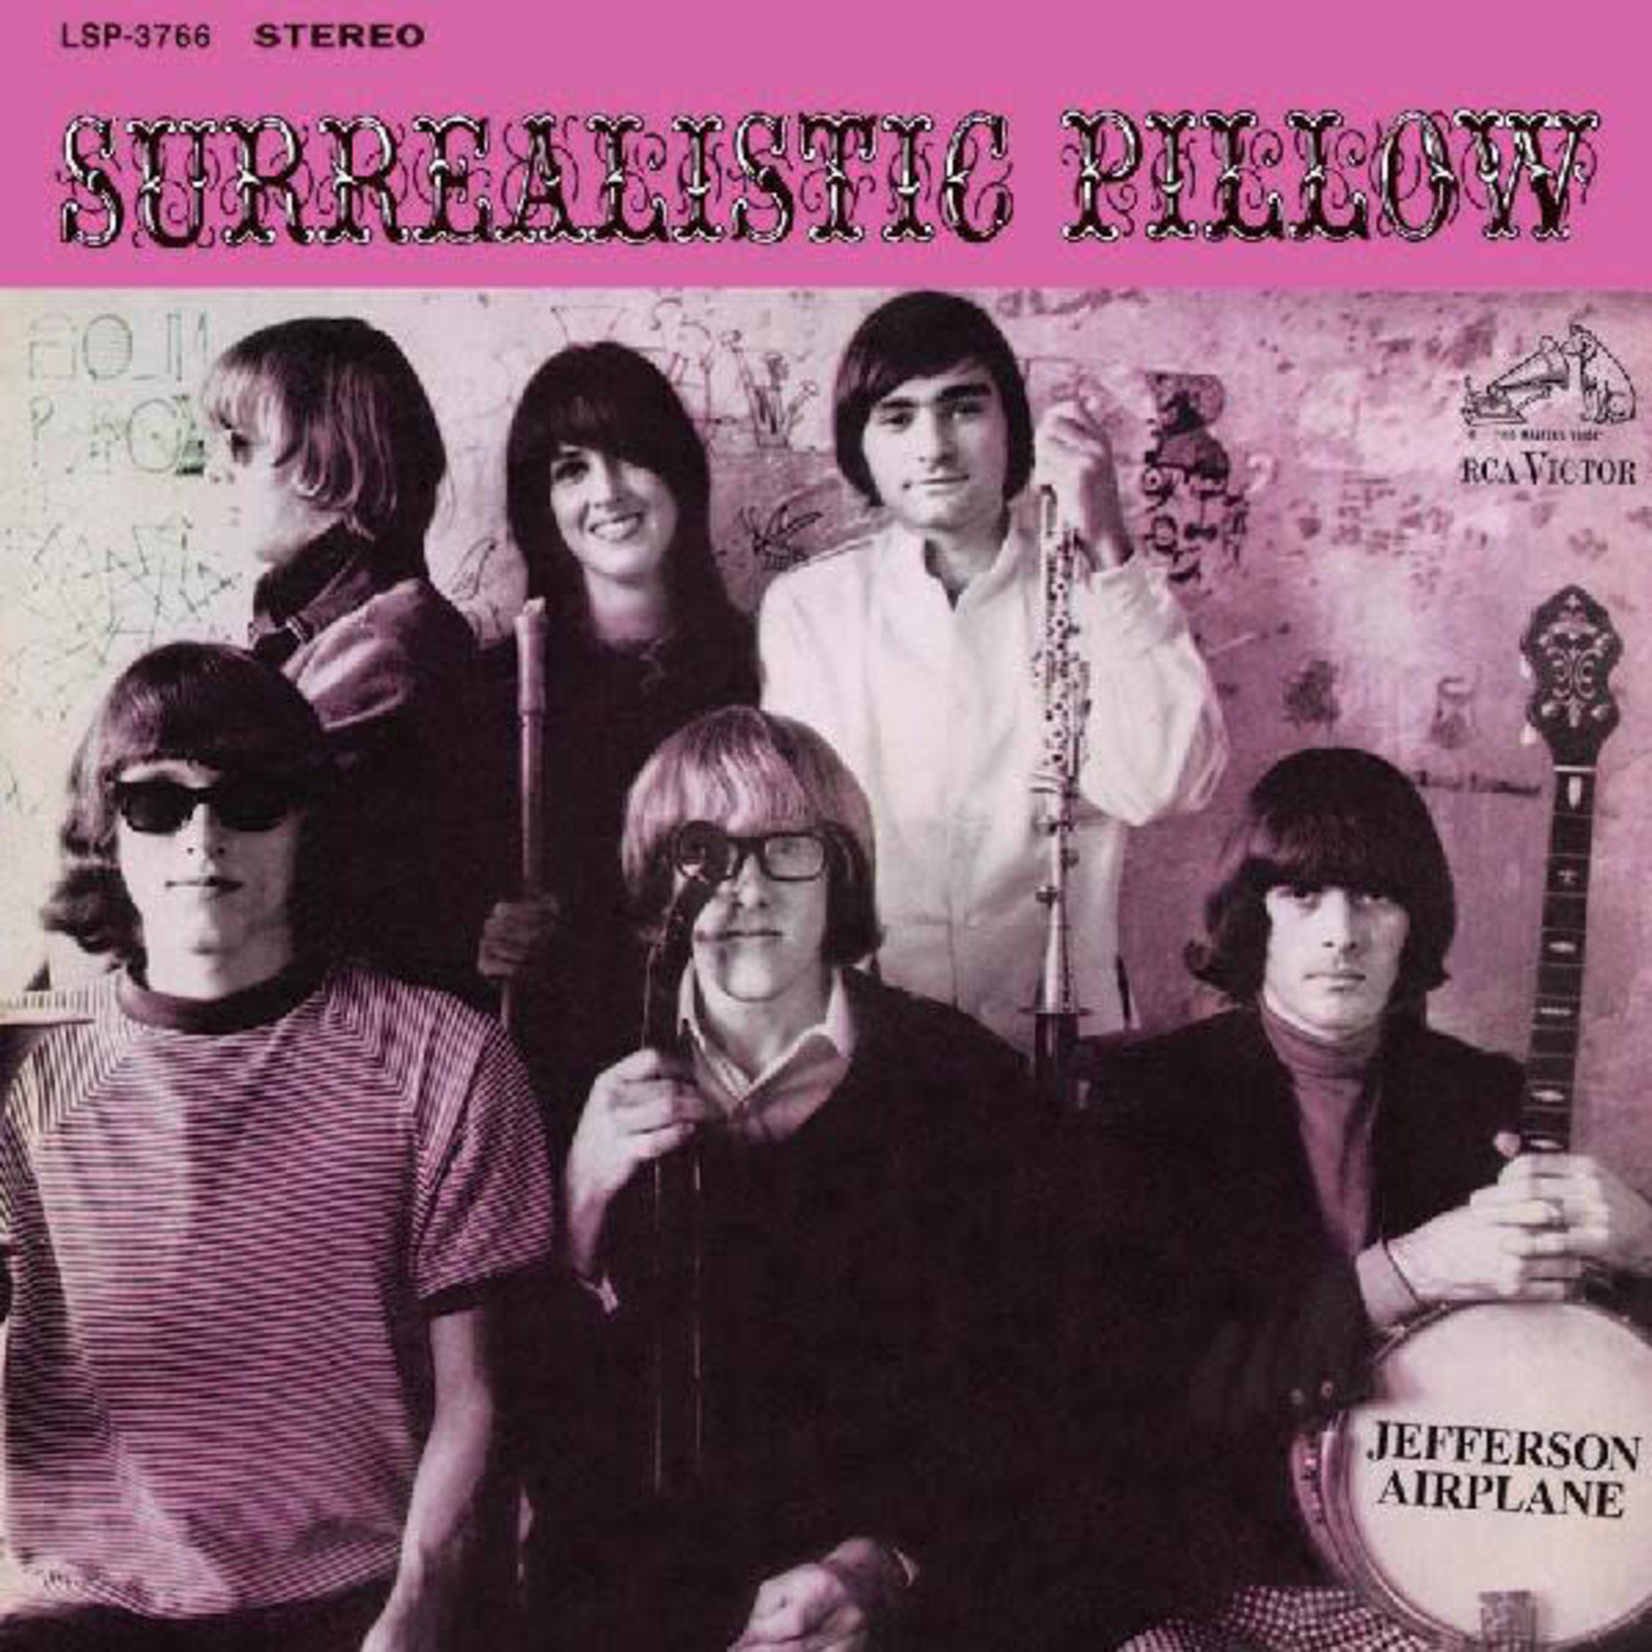 [Vintage] Jefferson Airplane: Surrealistic Pillow (reissue)